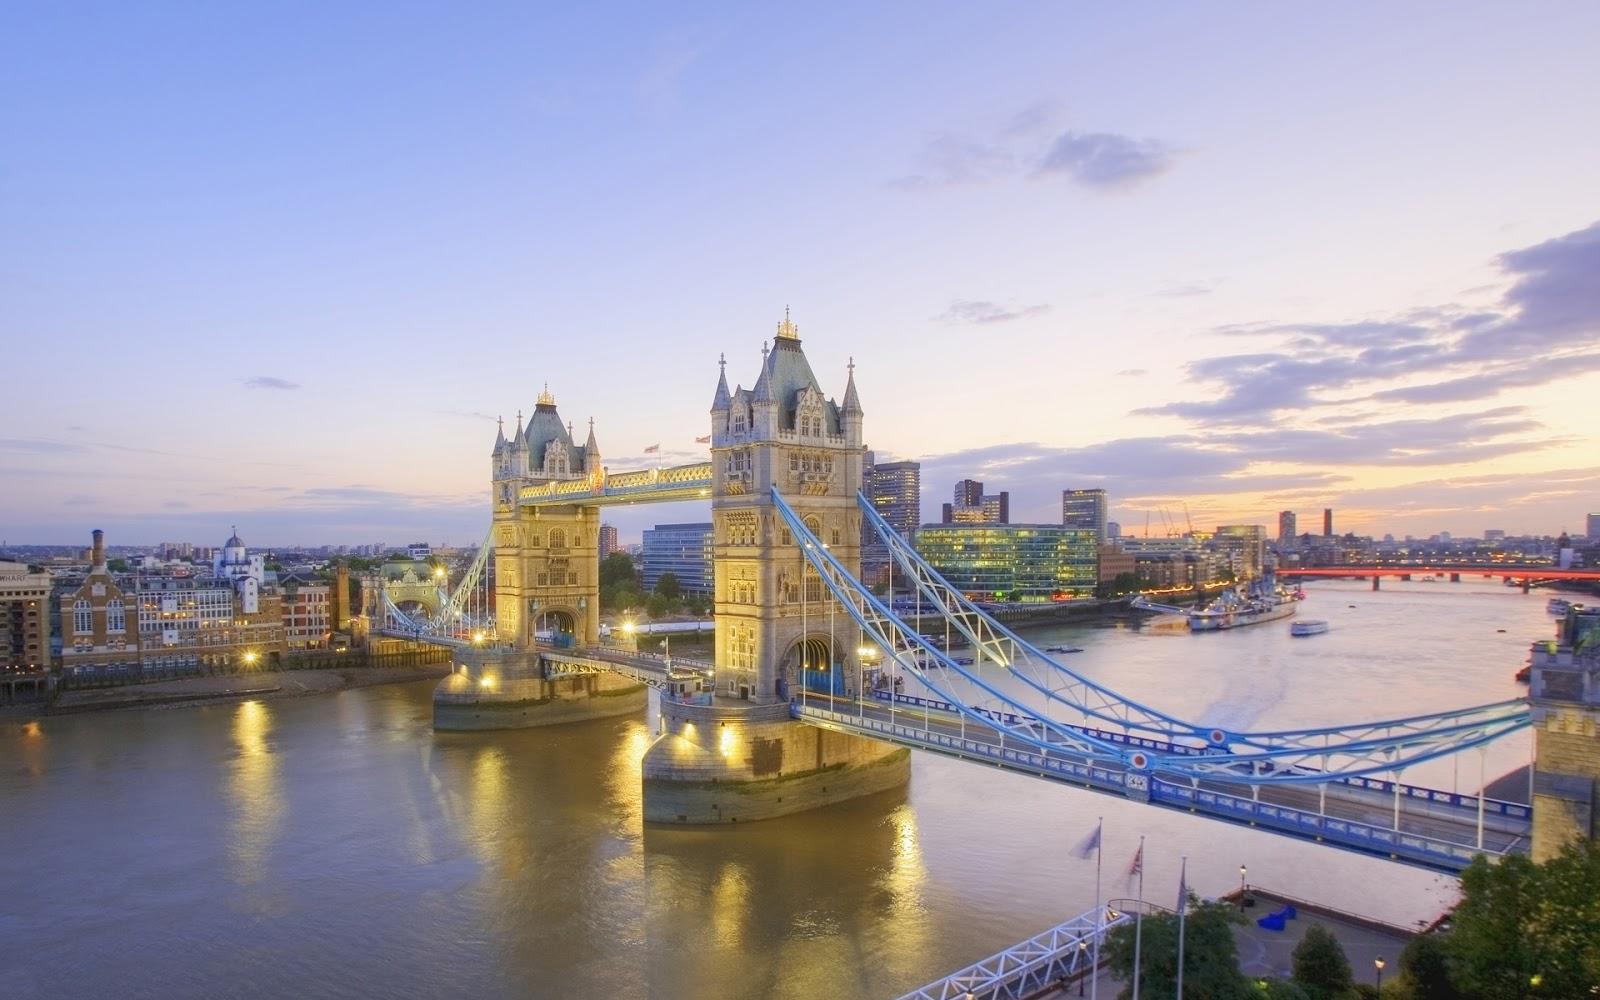 http://2.bp.blogspot.com/-_J4GBo0xPTI/UKnvRrZB_6I/AAAAAAAAA2g/05vMli-vtpY/s1600/wallpaper-windows-seven-london-england-bridge-river-nature-thames-tower-14155.jpg